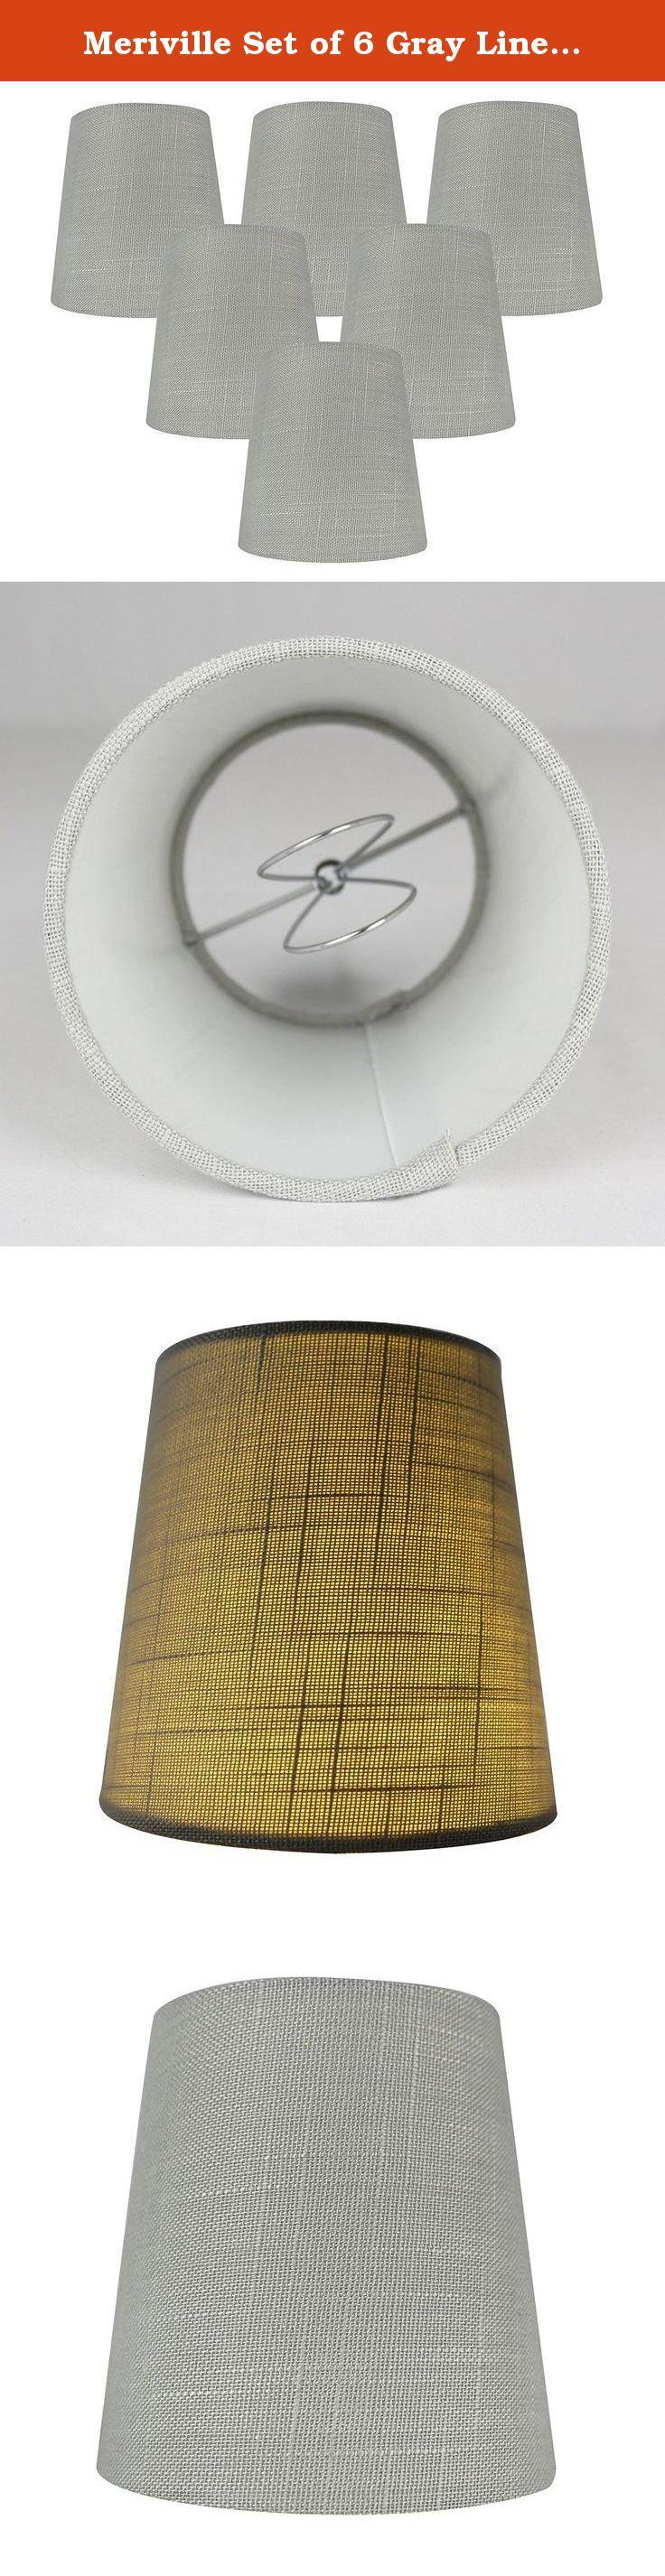 Meriville Set of 6 Gray Linen Clip Chandelier Lamp Shades 3 5